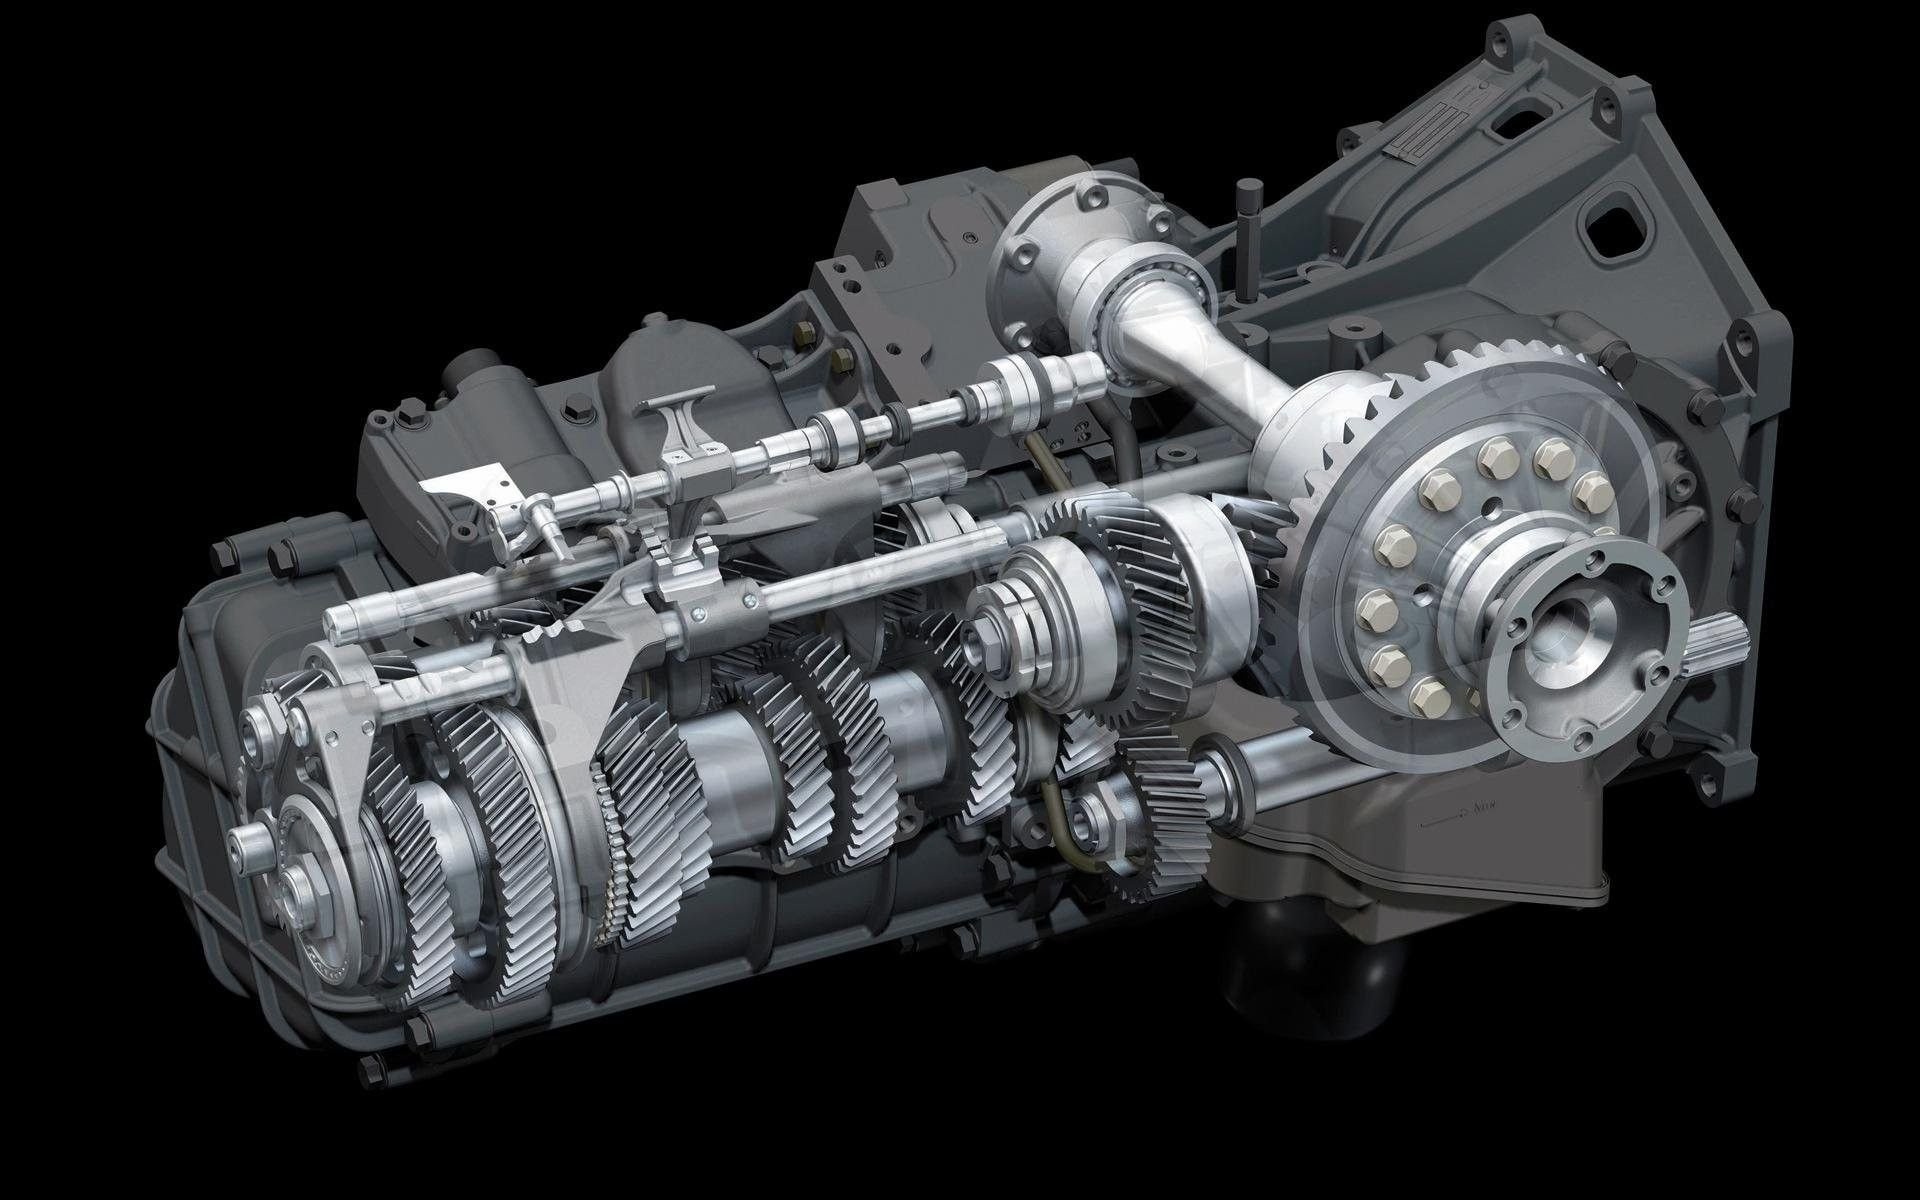 Mechanical engineering car engine - photo#50